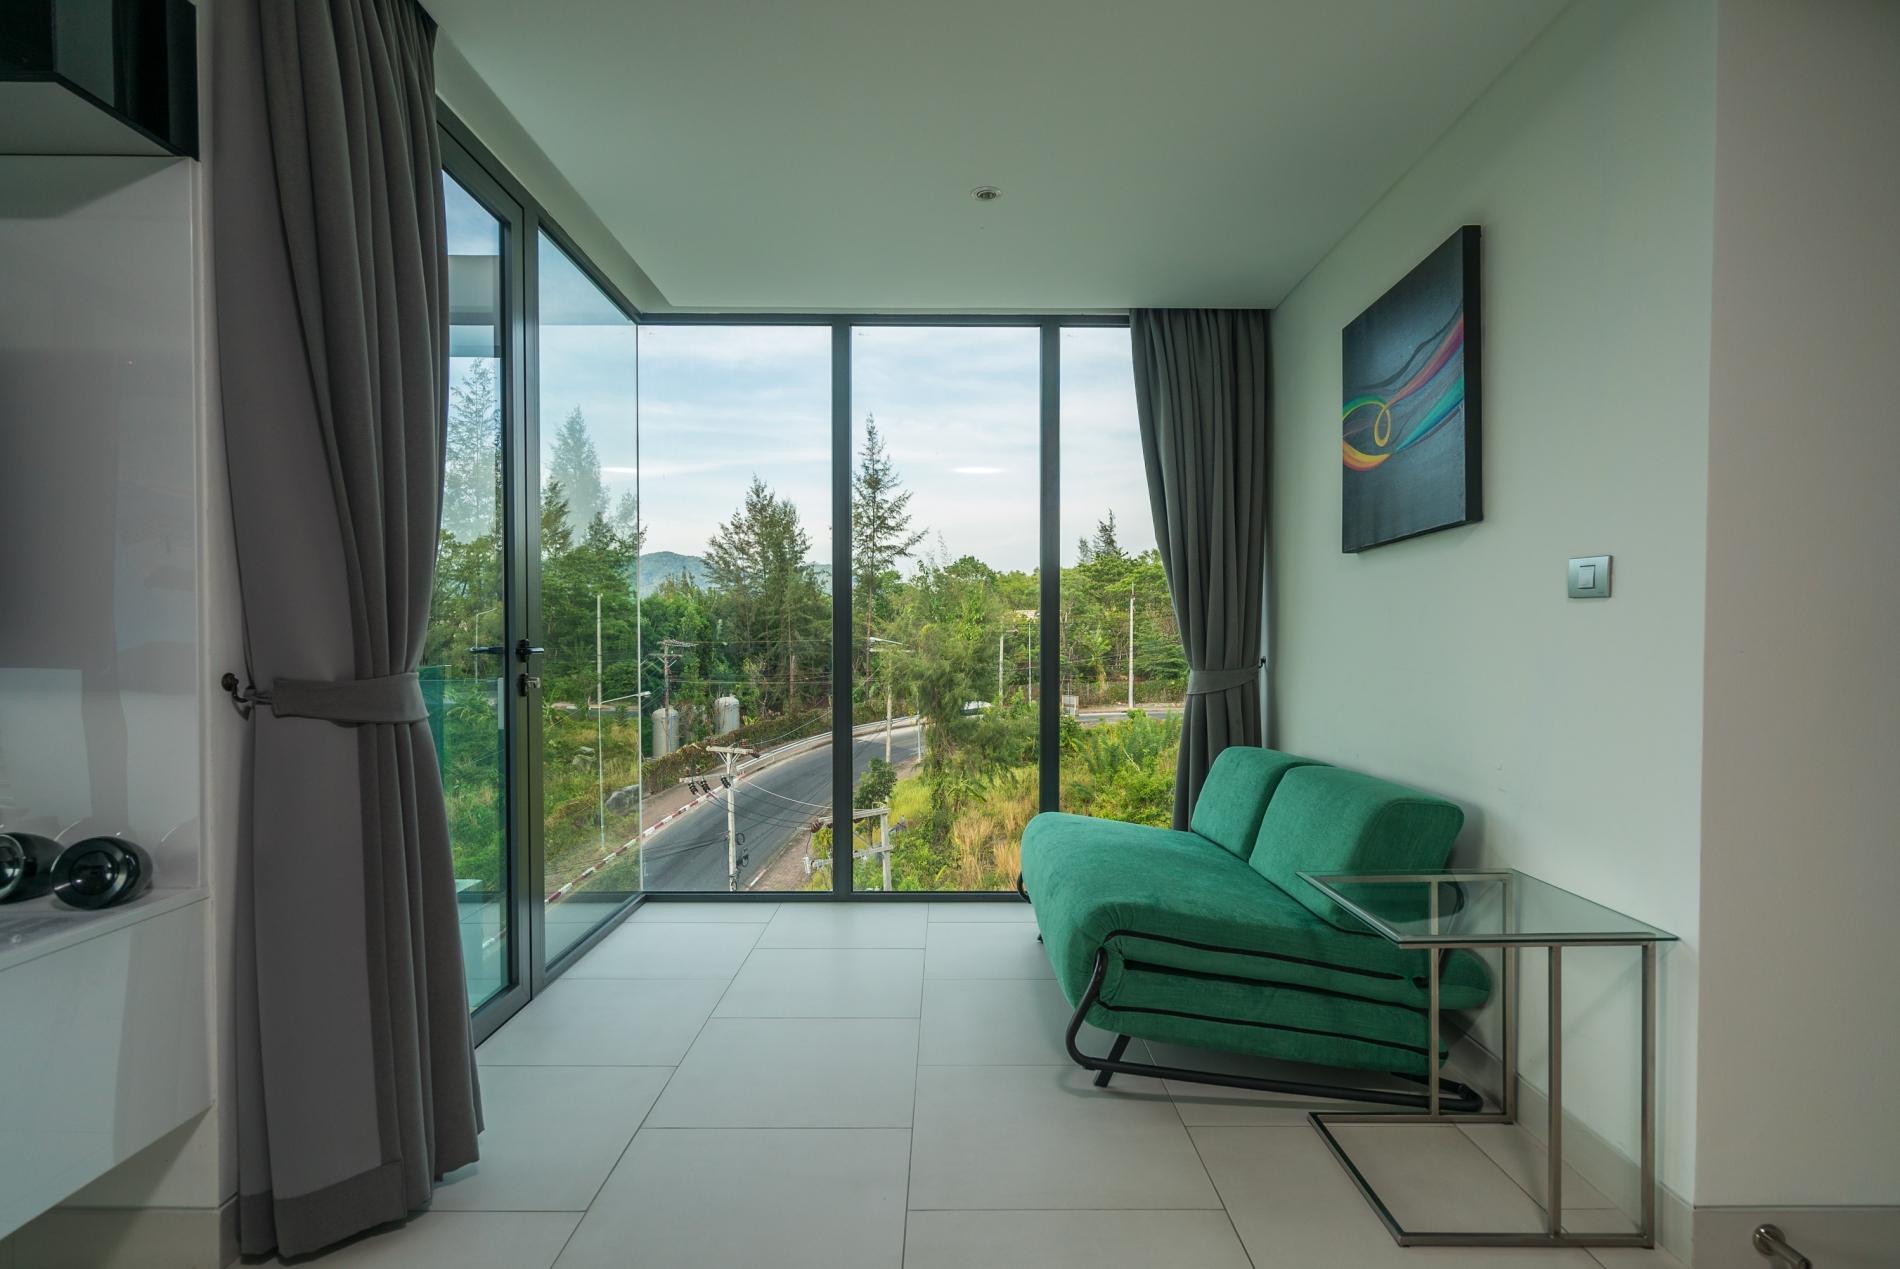 Apartment Twin Sands 1406 - Panoramic seaview apartment walk to beach  shared pool photo 16918929